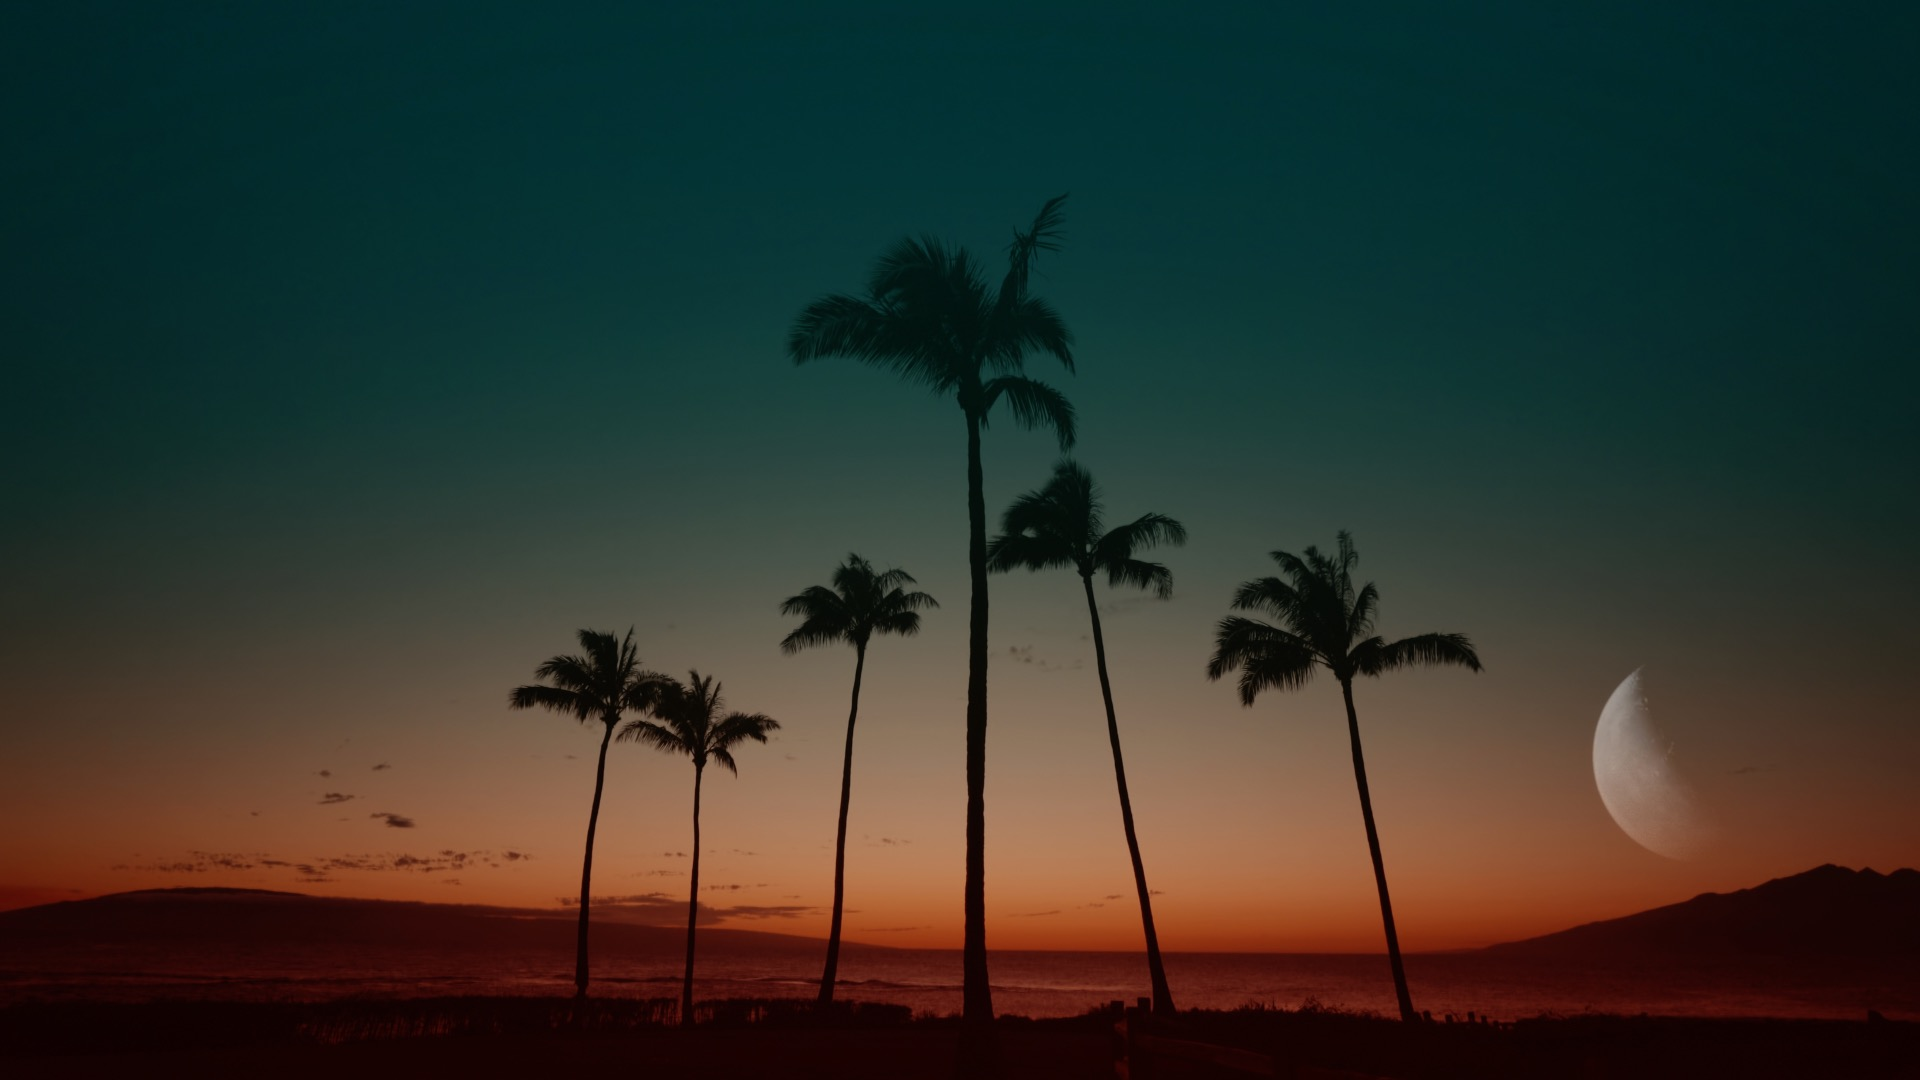 VMC-Palms-Remix-01-HD STILL-0.jpg